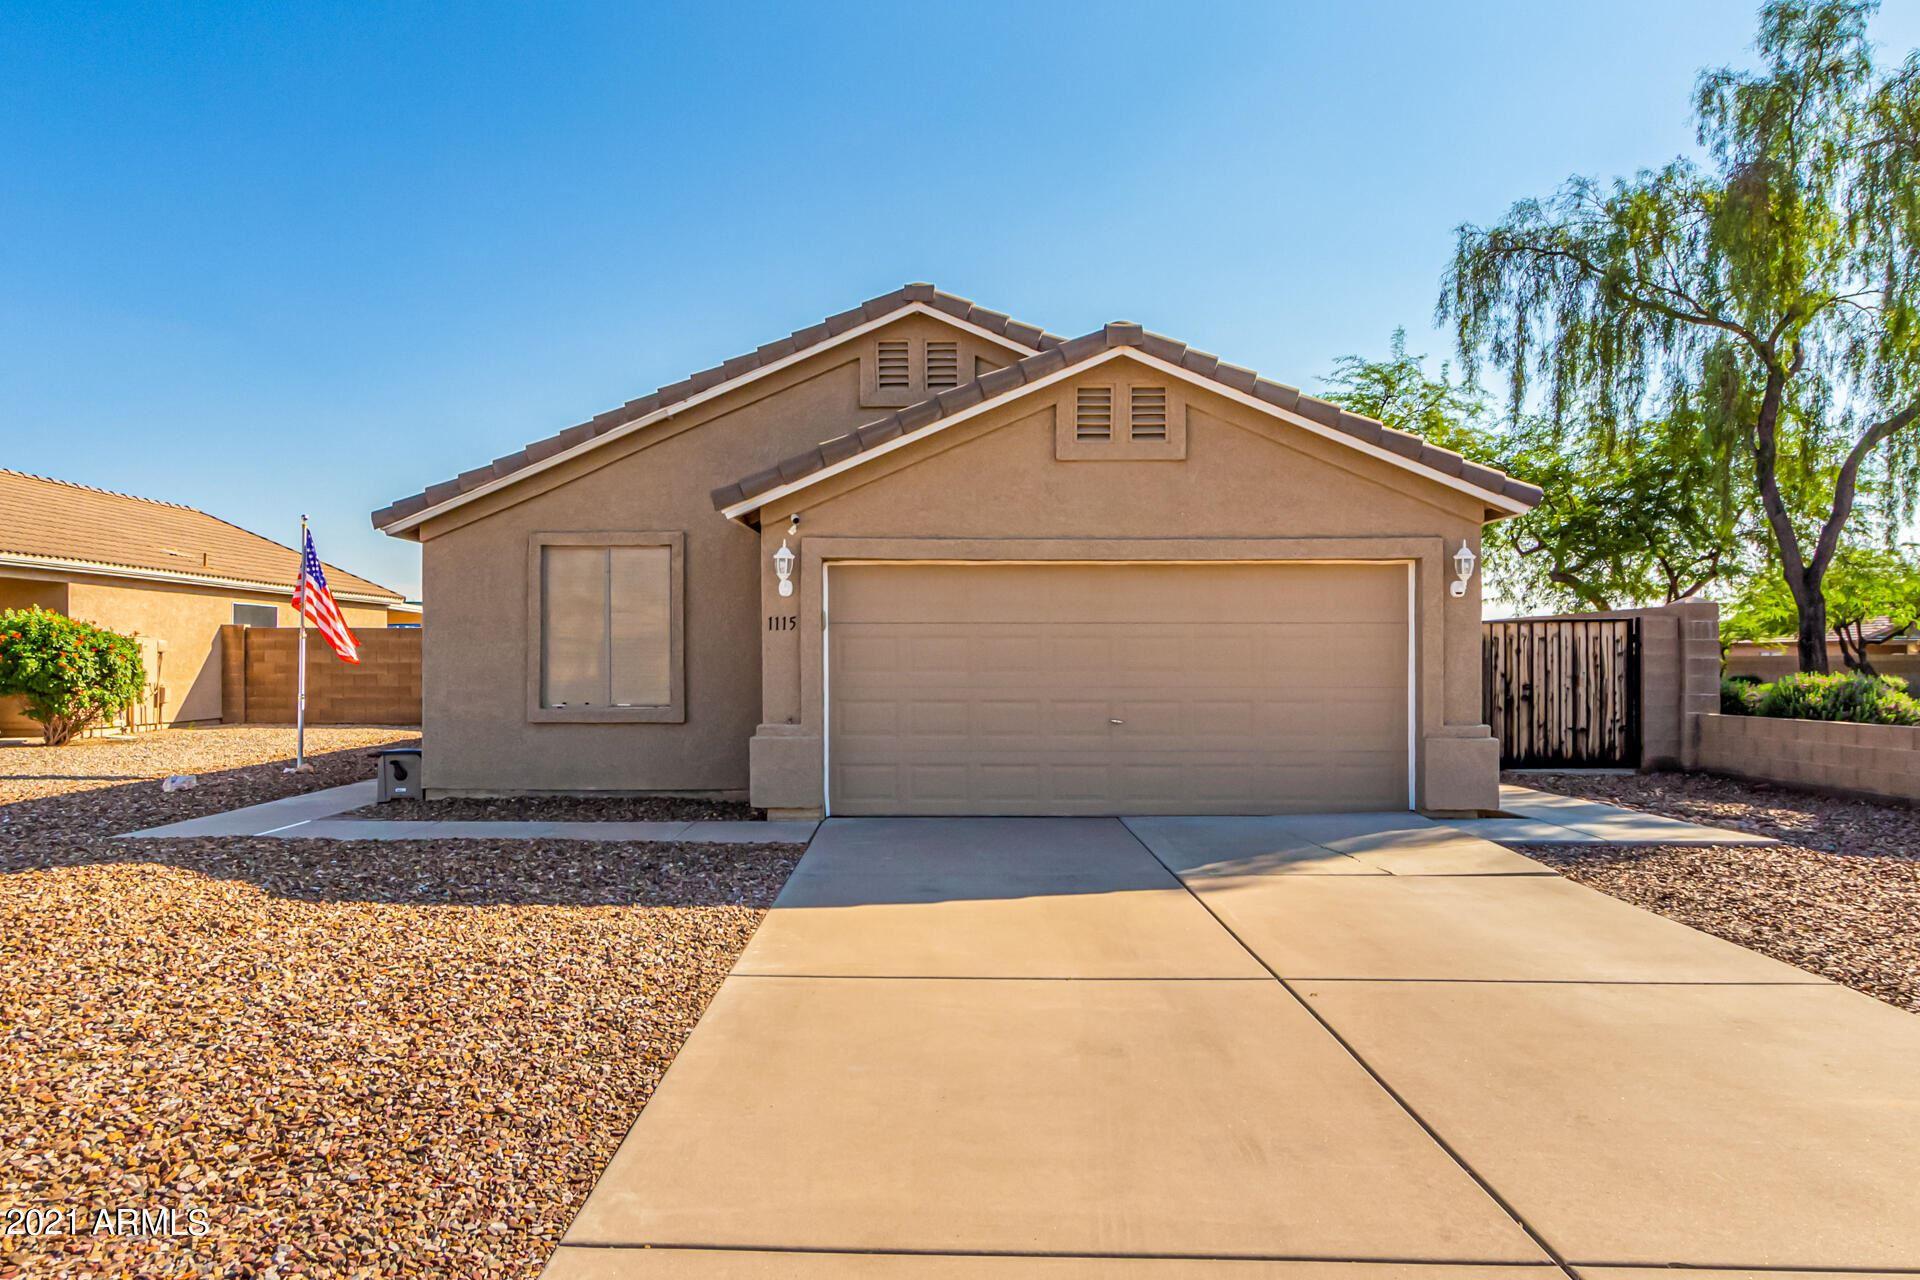 Photo of 1115 W ROSAL Avenue, Apache Junction, AZ 85120 (MLS # 6280647)